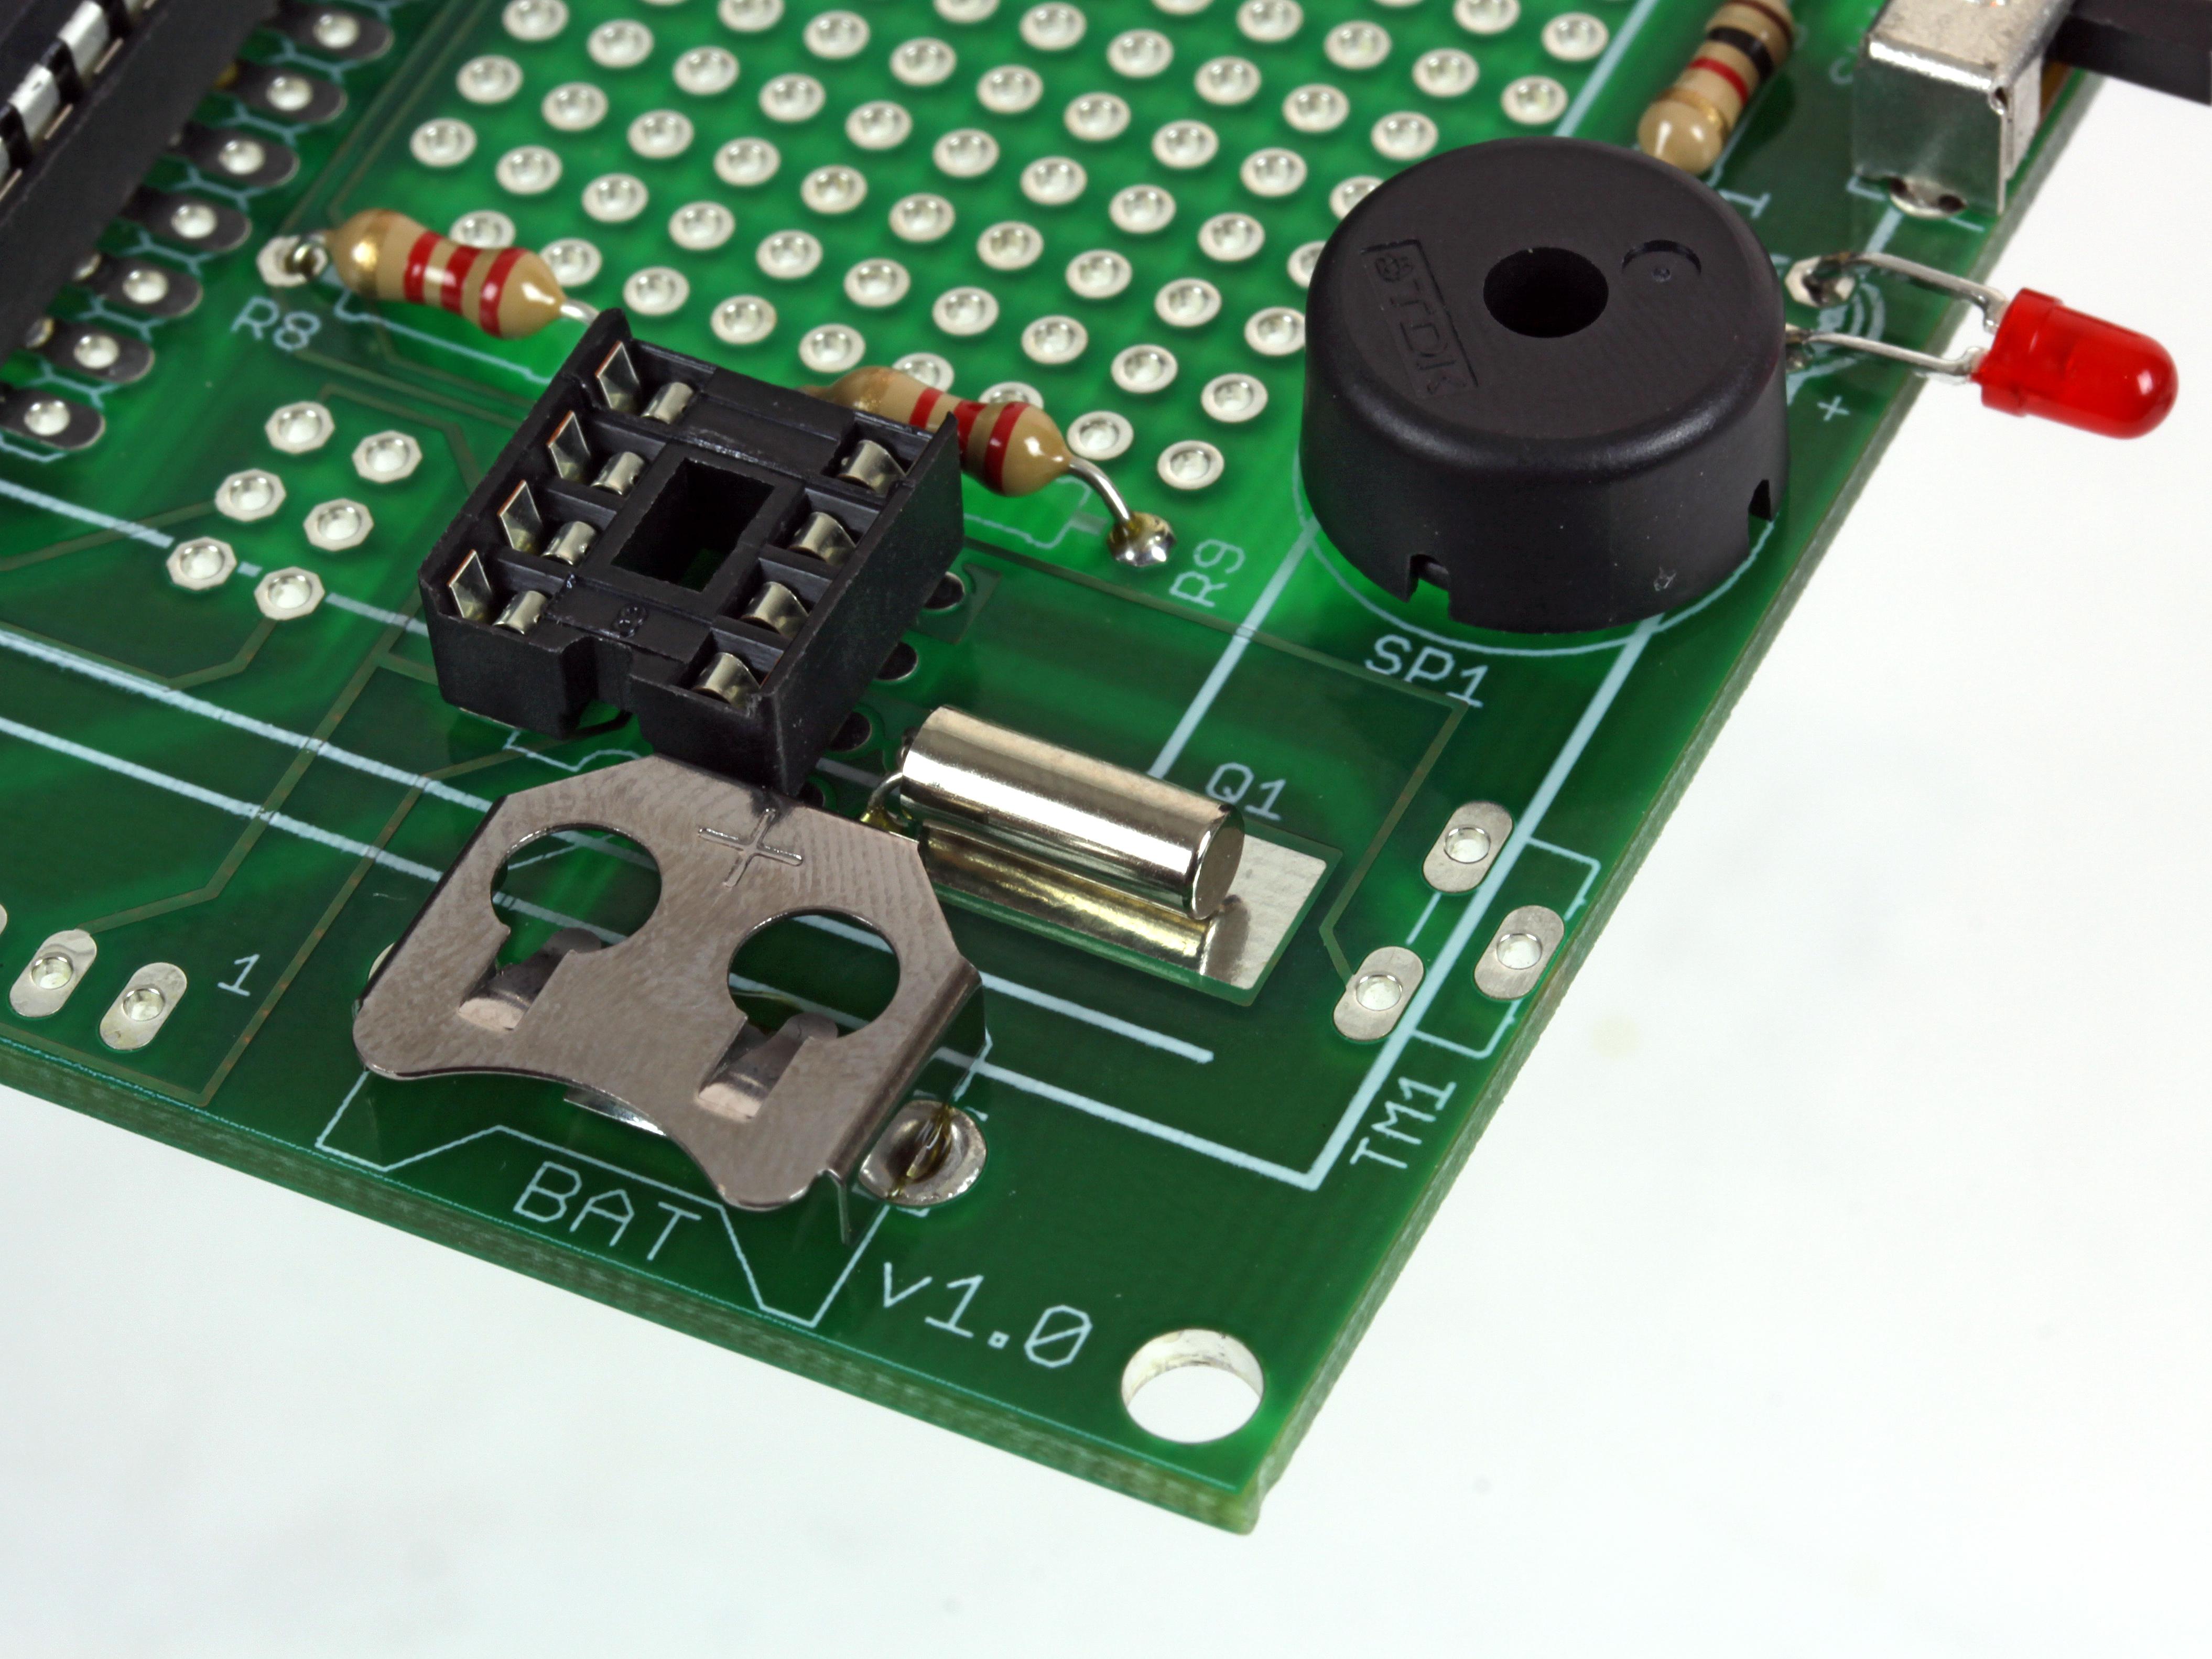 New Project: Build a Monochron ClockKit